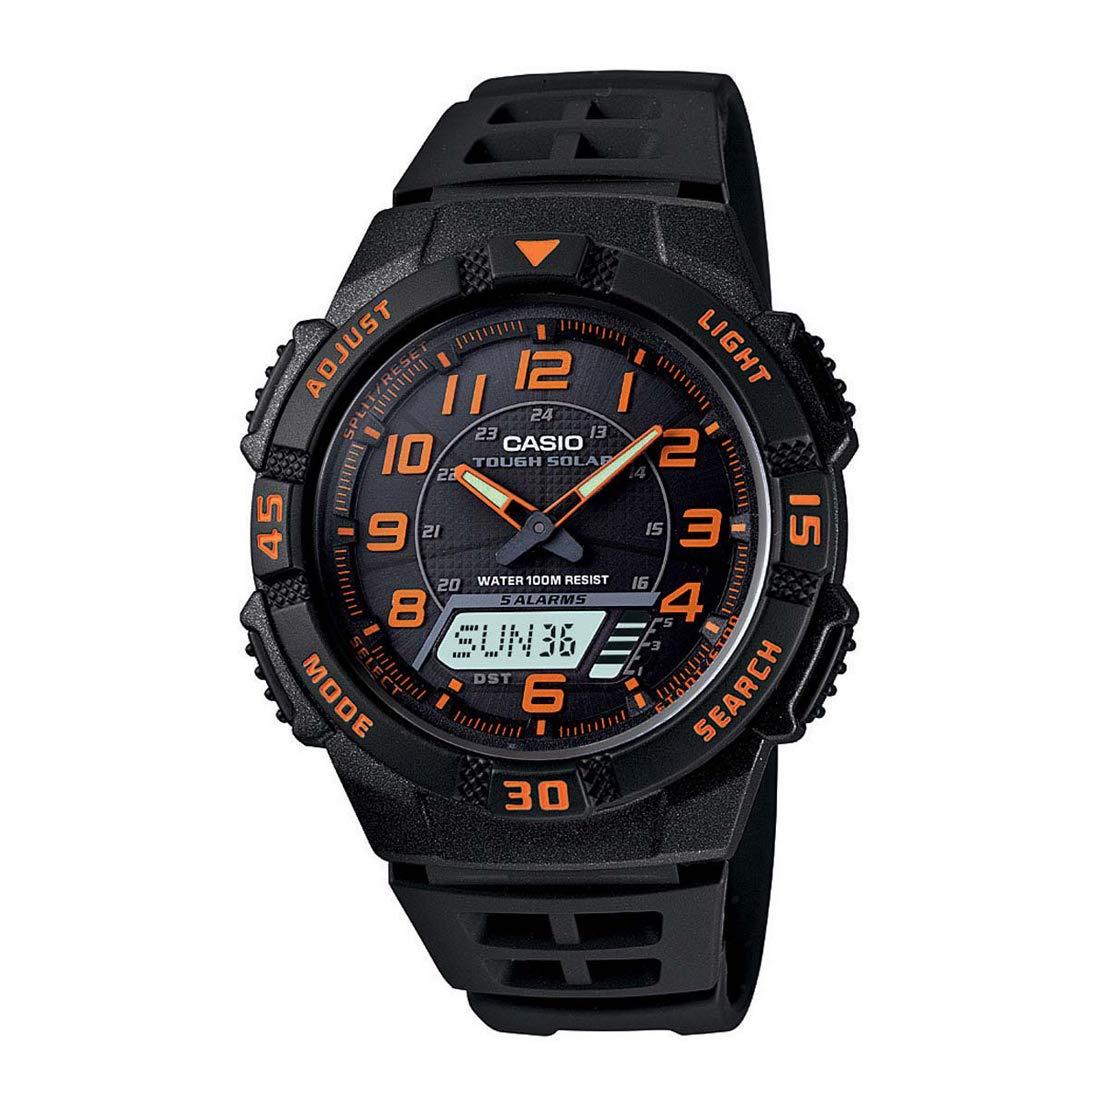 Men's Slim Casio Solar Multi-Function Analogue Digital Watch